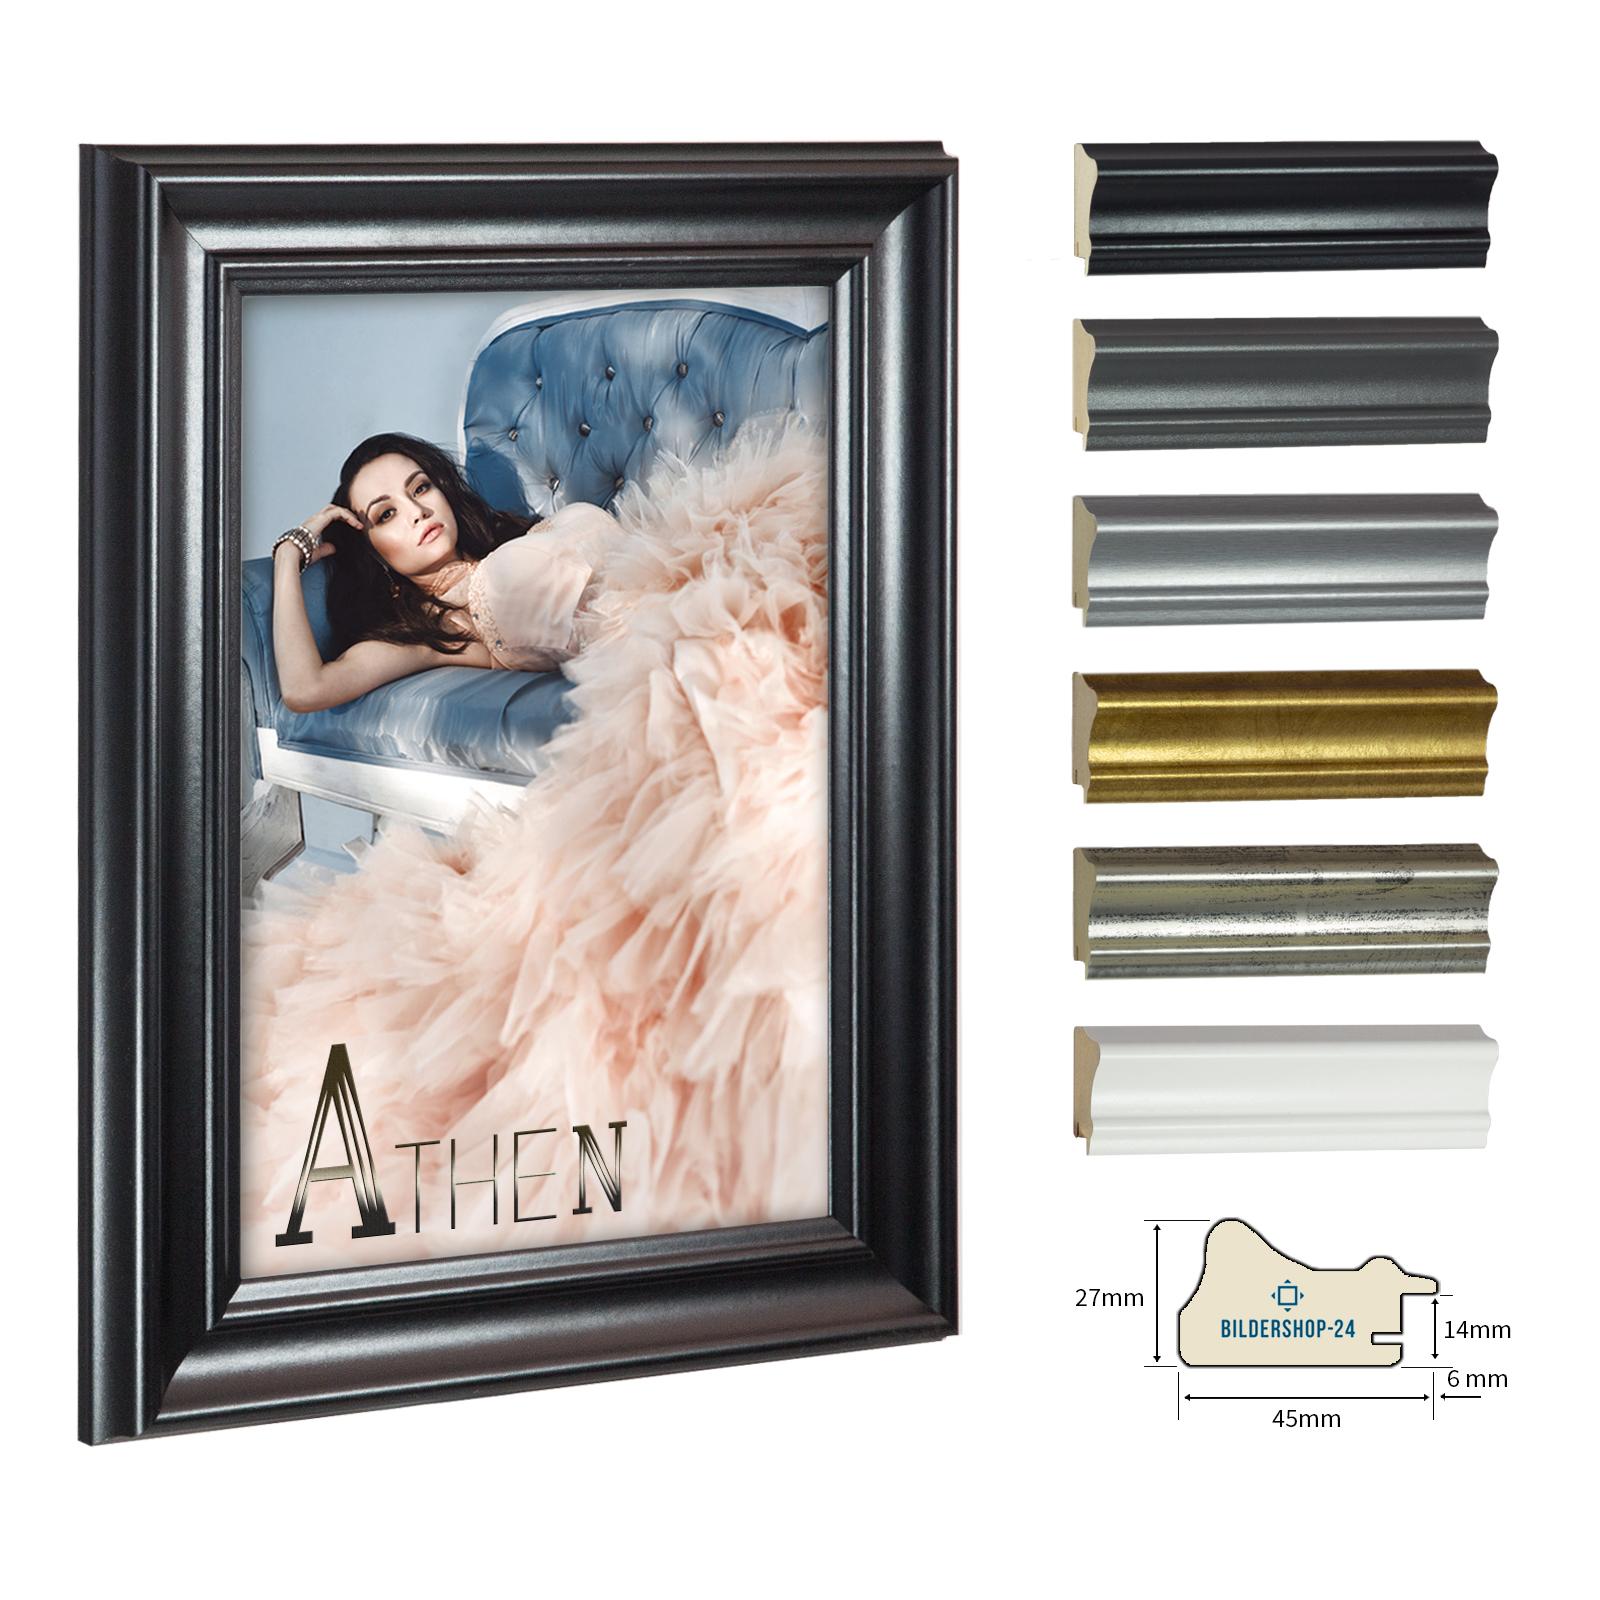 bilderrahmen barockrahmen athen 90x120 70x100 30x40 60x80 gold silber wei alu ebay. Black Bedroom Furniture Sets. Home Design Ideas